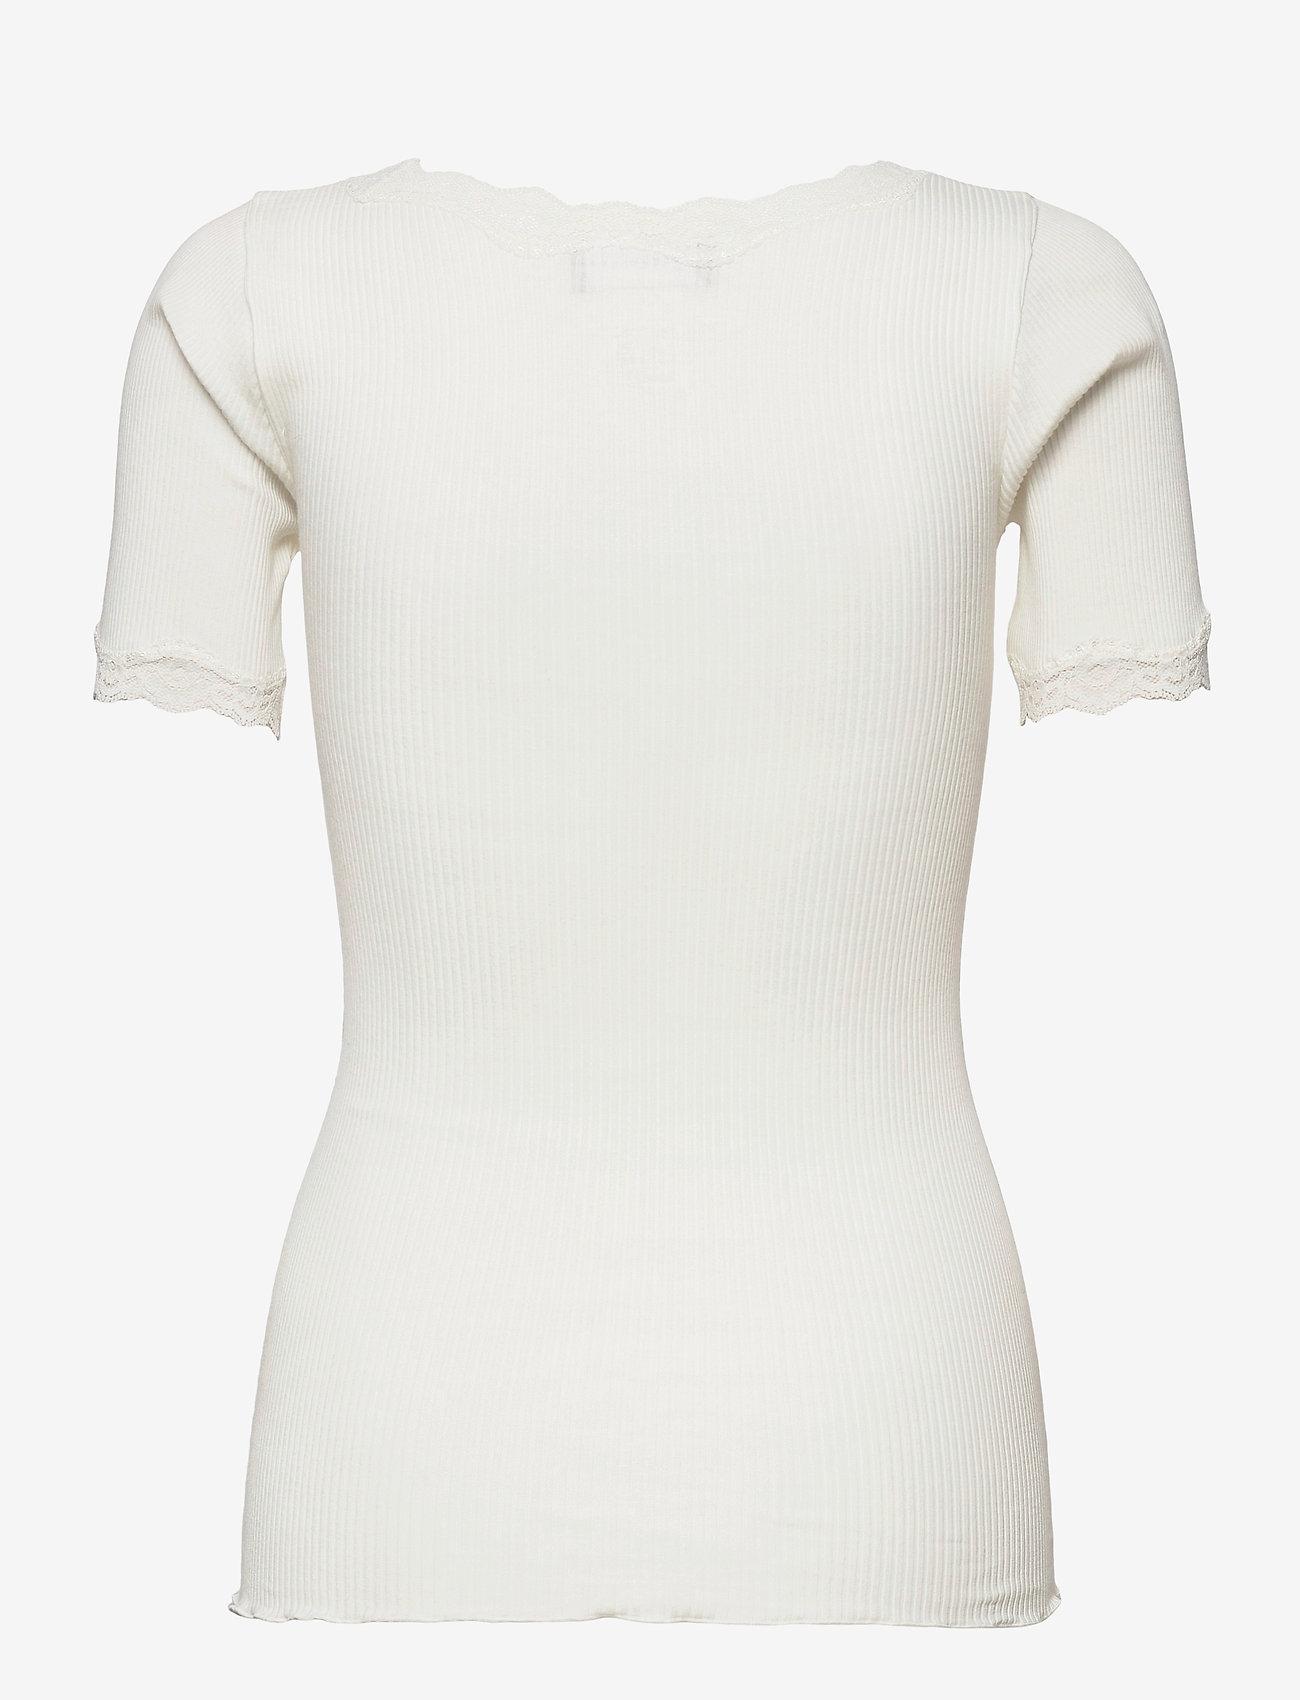 Rosemunde - Organic t-shirt regular ss w/ rev,v - t-shirts - ivory - 1